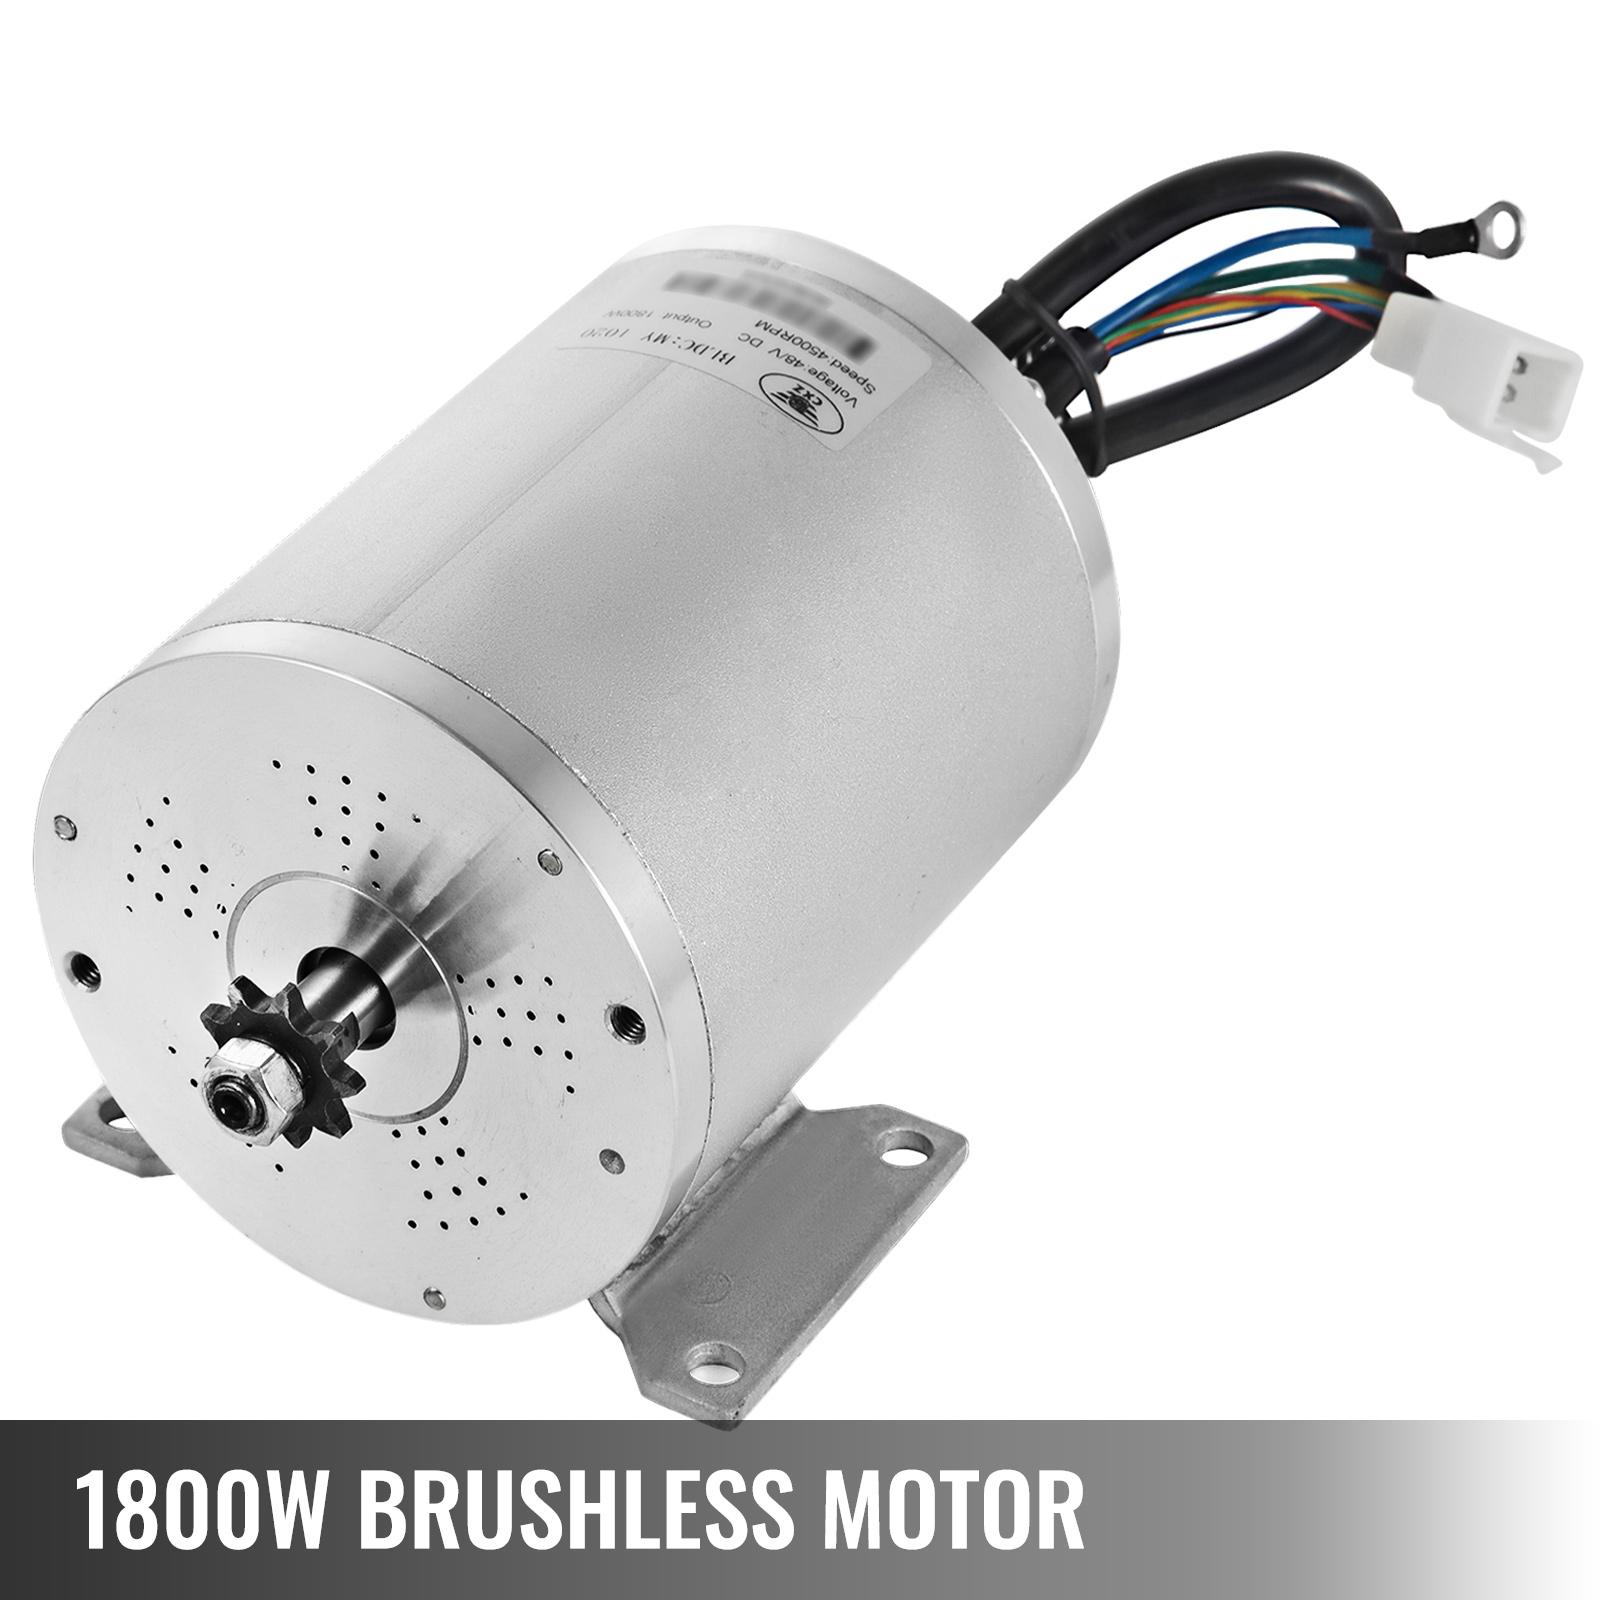 DC-electric-motor-12-60V-150W-2KW-for-scooter-bike-go-kart-minibike-e-ATV thumbnail 159